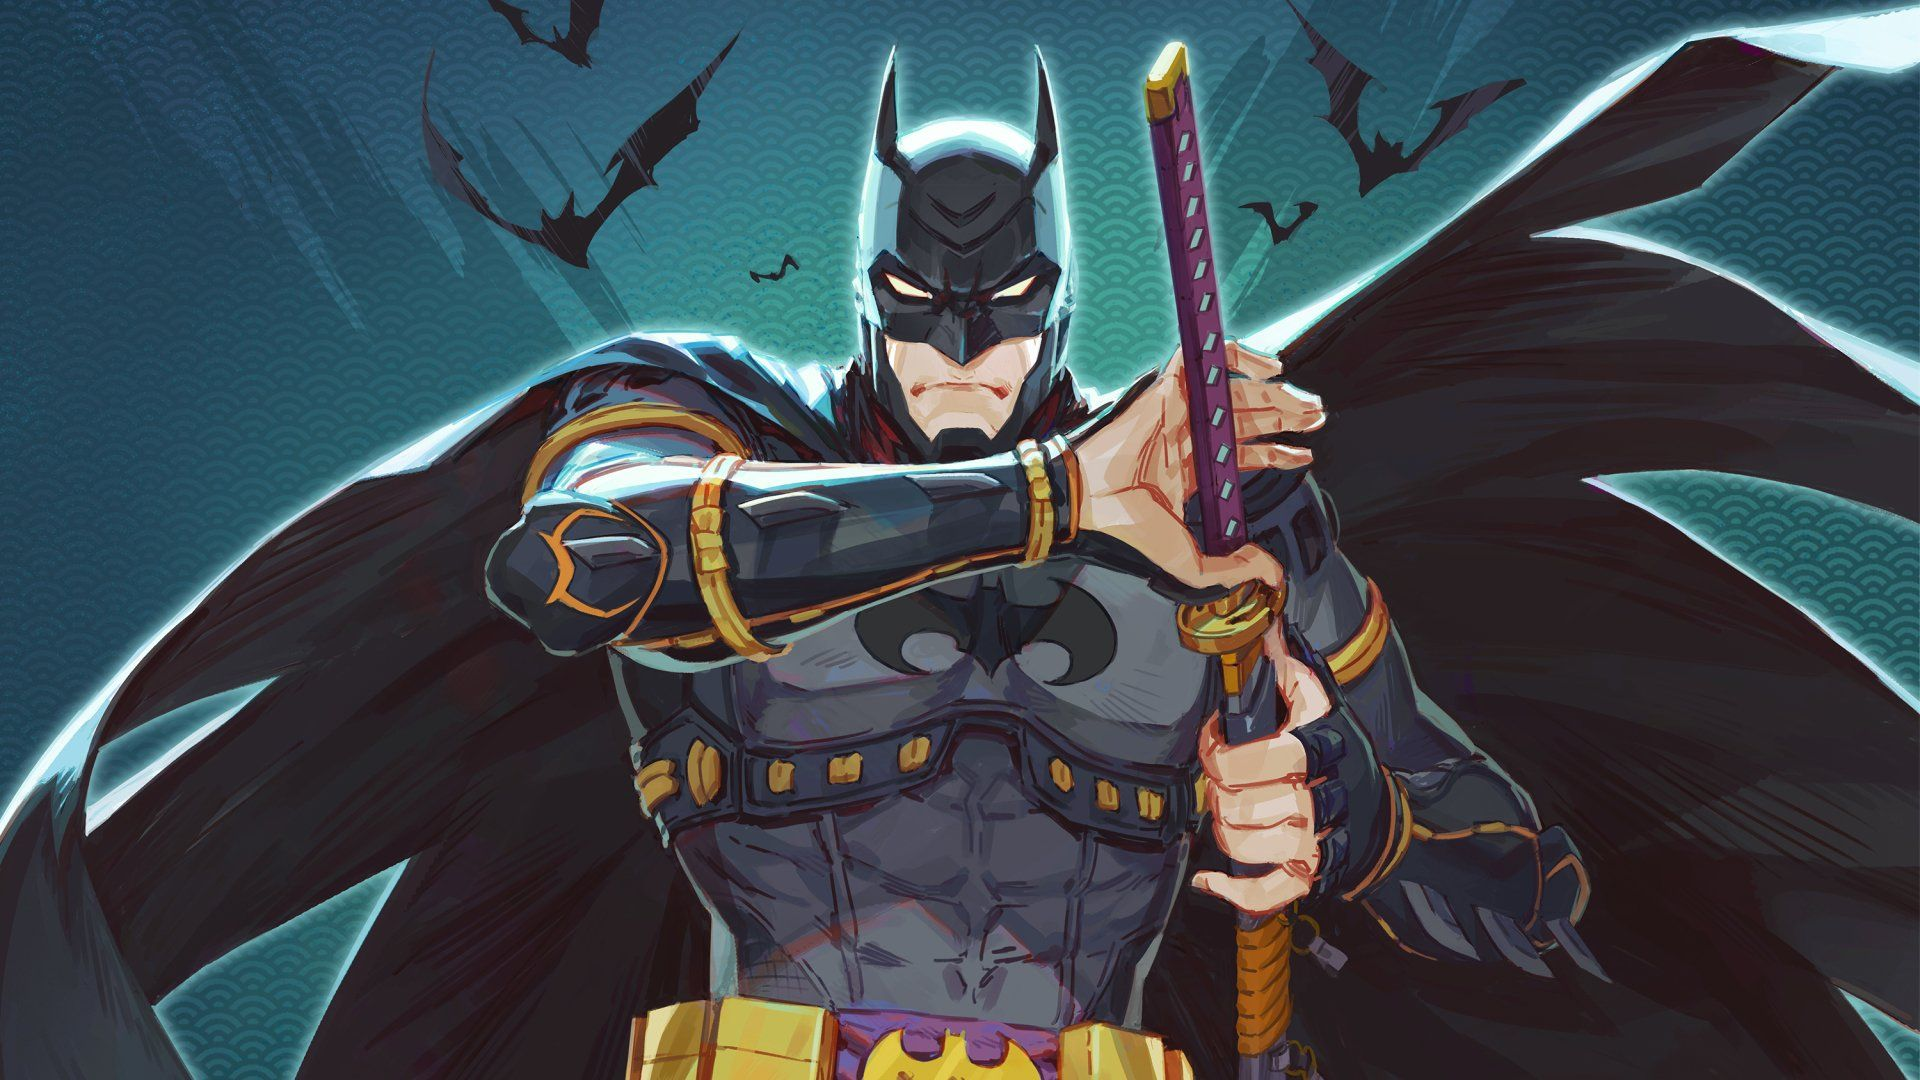 Batman Ninja Wallpapers   Top Batman Ninja Backgrounds 1920x1080